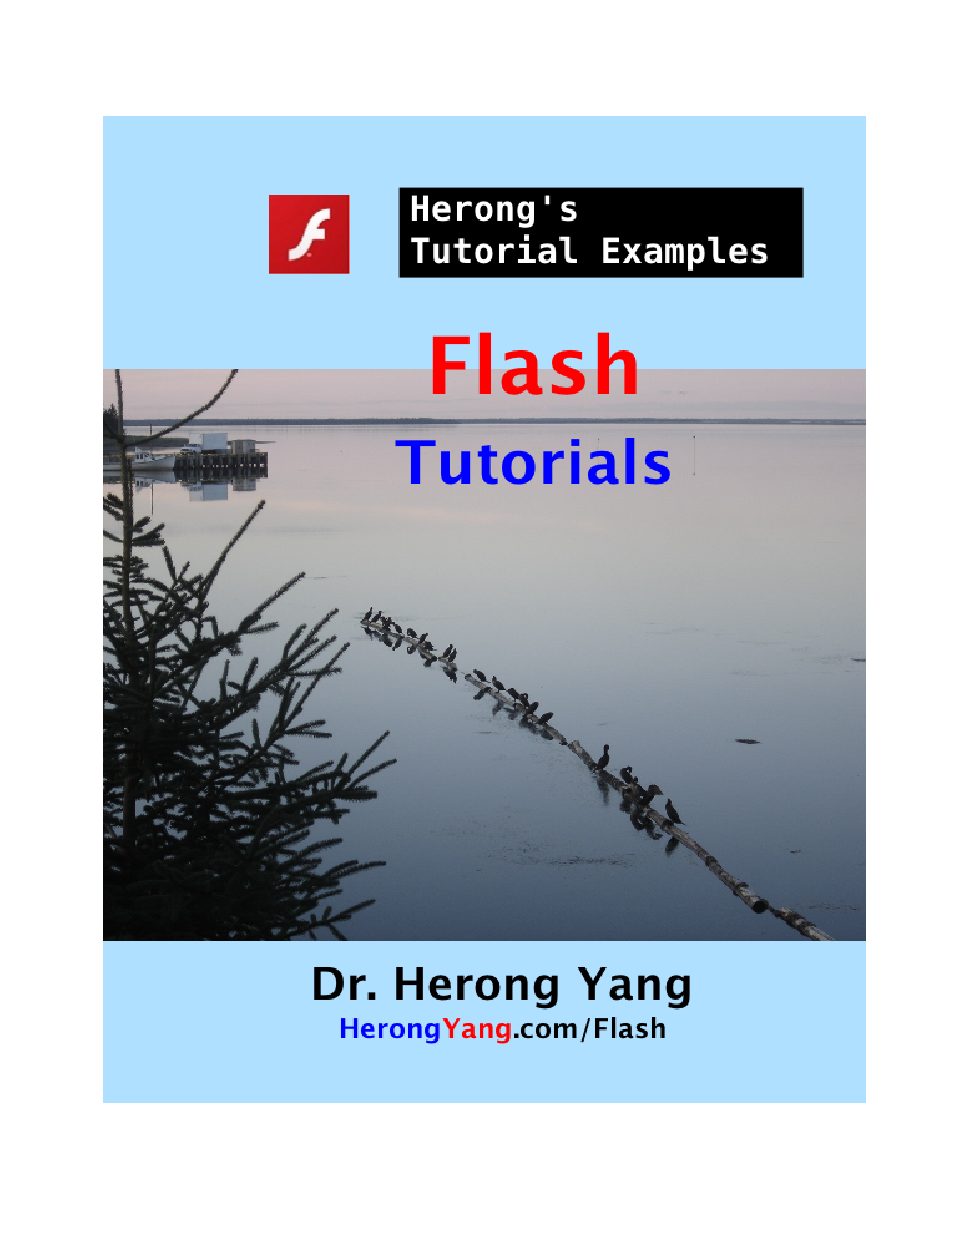 Full Version in PDF/EPUB: Flash Tutorials